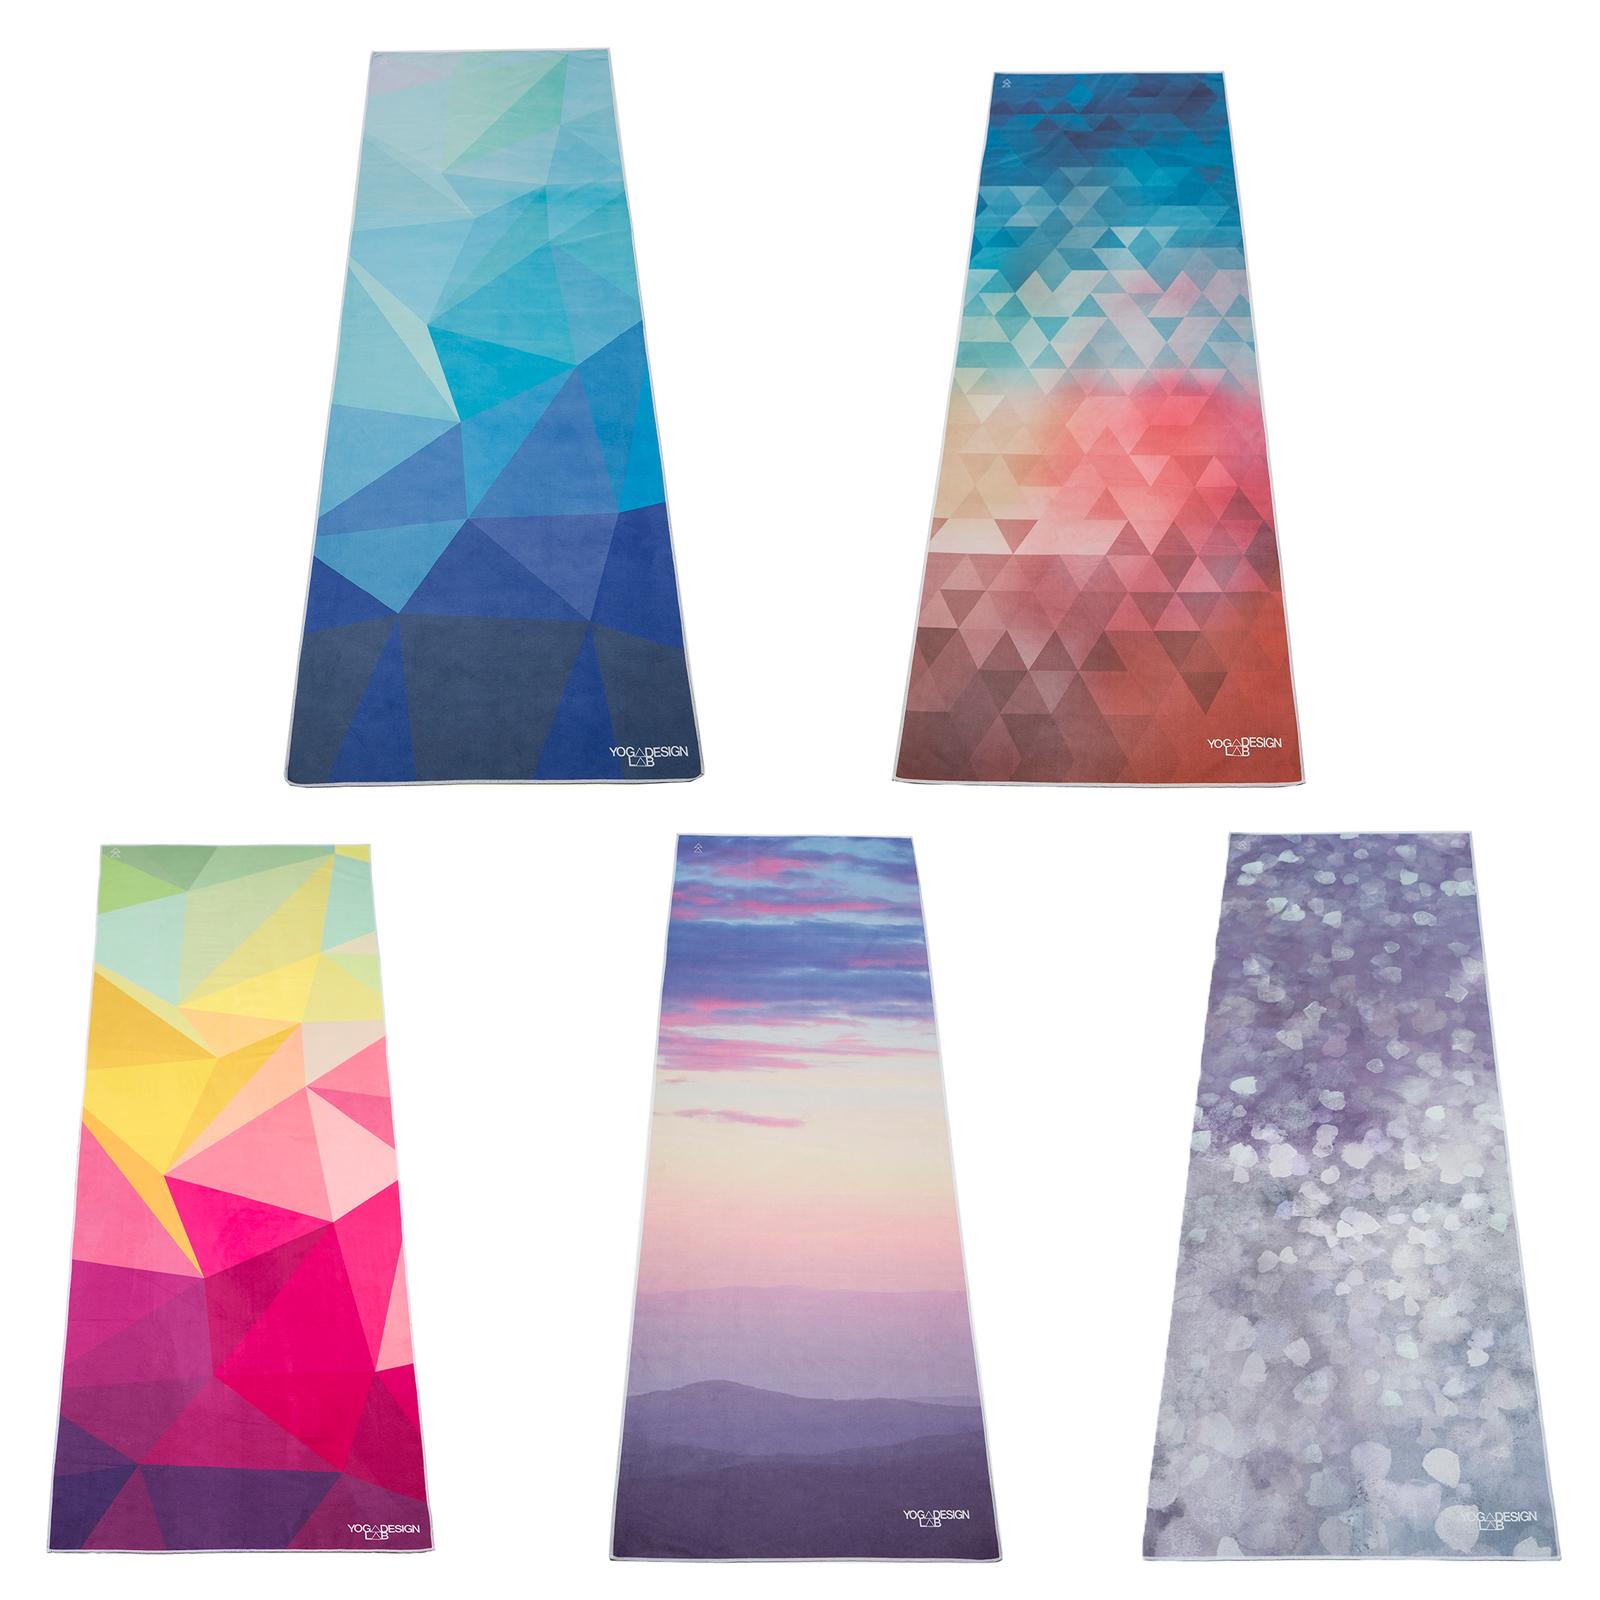 6aa080e26ac809 Details about Yoga Design Lab Super Lightweight Ultra Absorbent Microfiber  Surface Yoga Towel